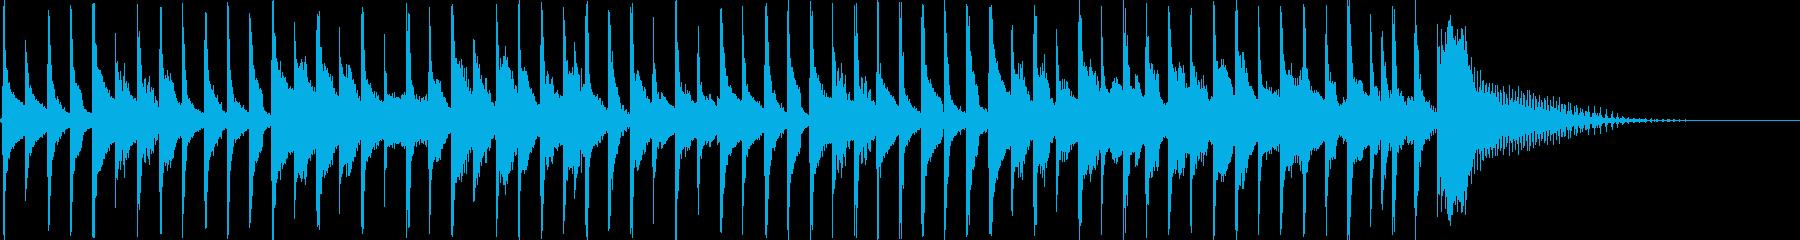 CMにぜひ!コミカルなボサノバ風の再生済みの波形